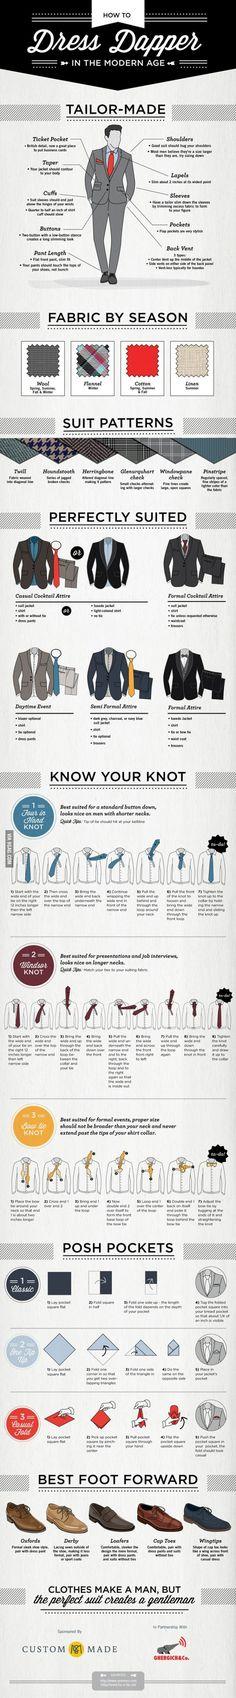 How to dress dapper in the modern age | Raddest Men's Fashion Looks On The Internet: http://www.raddestlooks.org